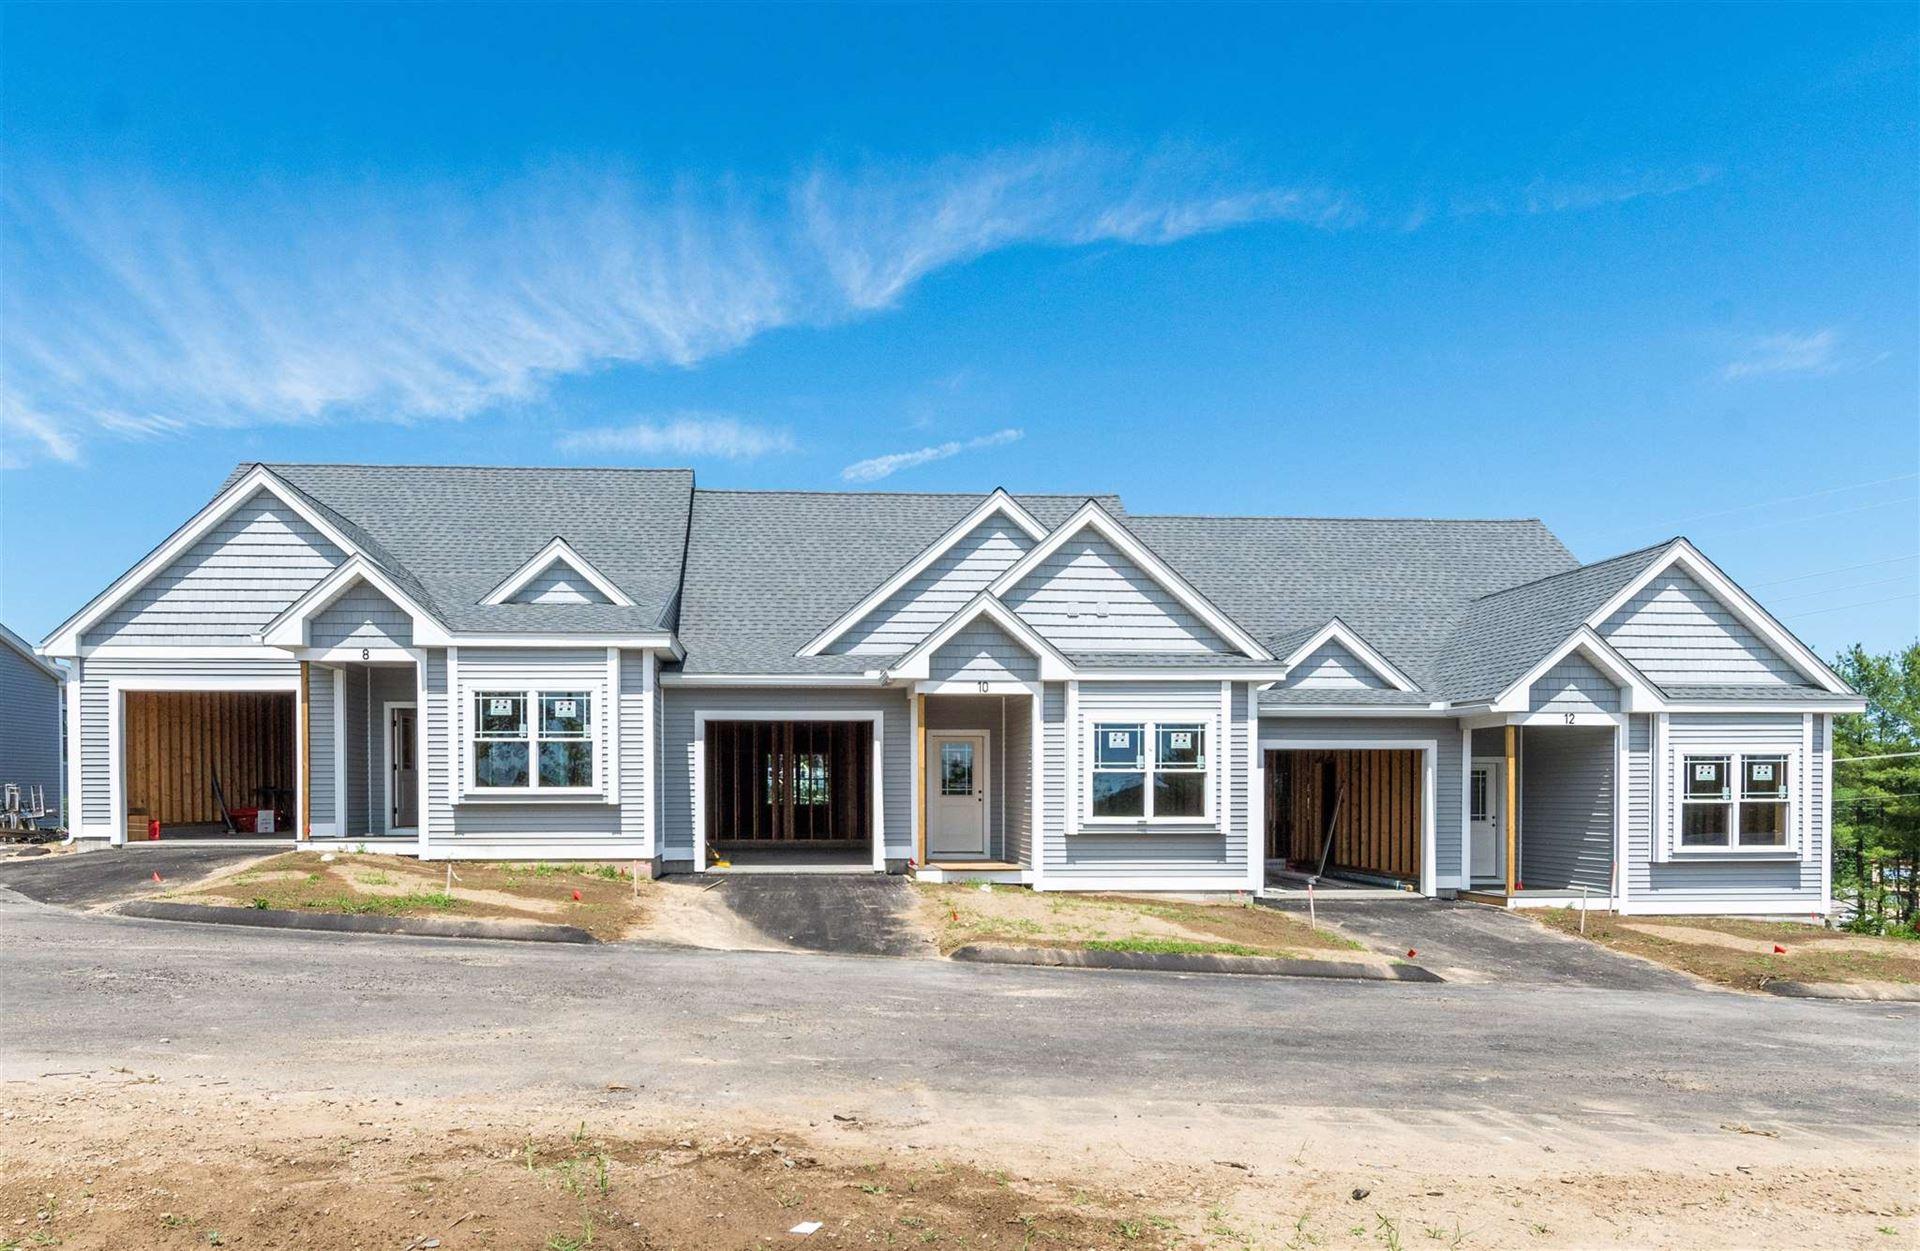 8 Abenaki Circle, Merrimack, NH 03054 - MLS#: 4796061